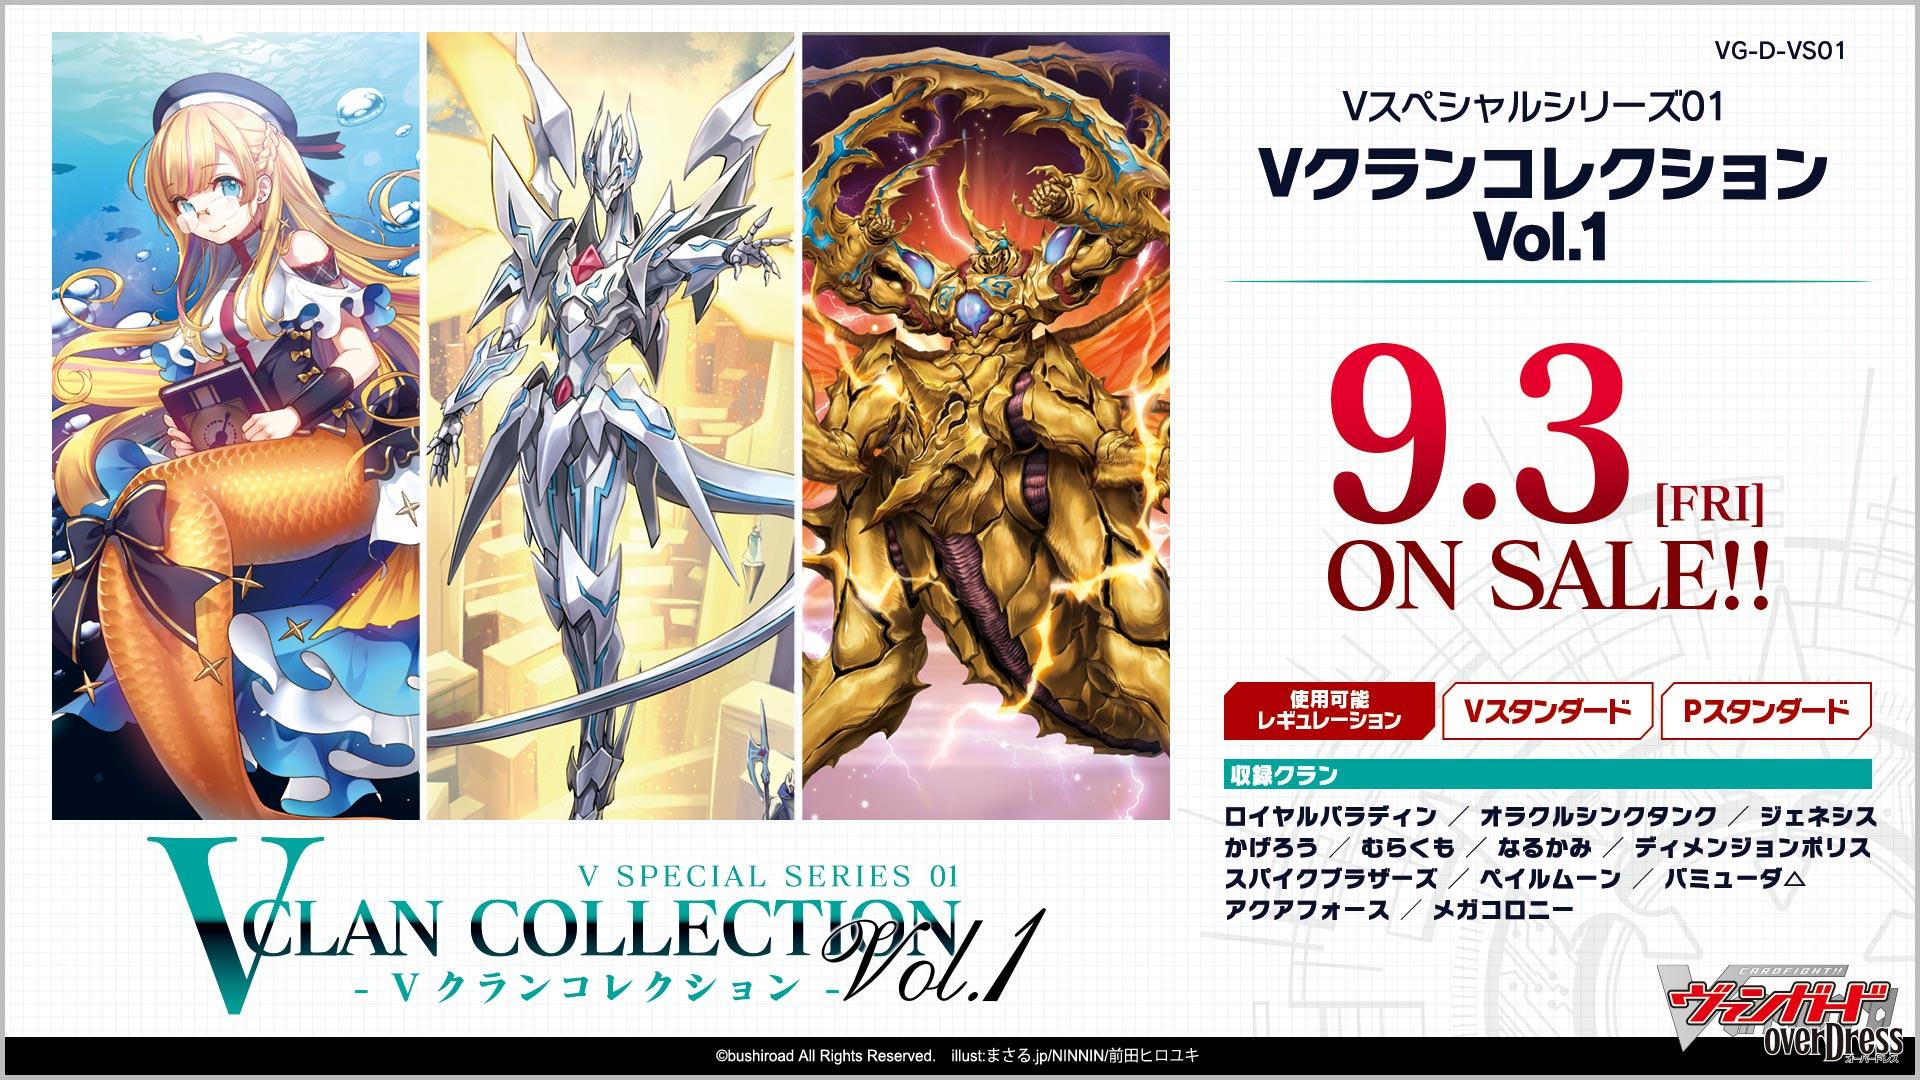 【D-VS01】「Vクランコレクション Vol.1」